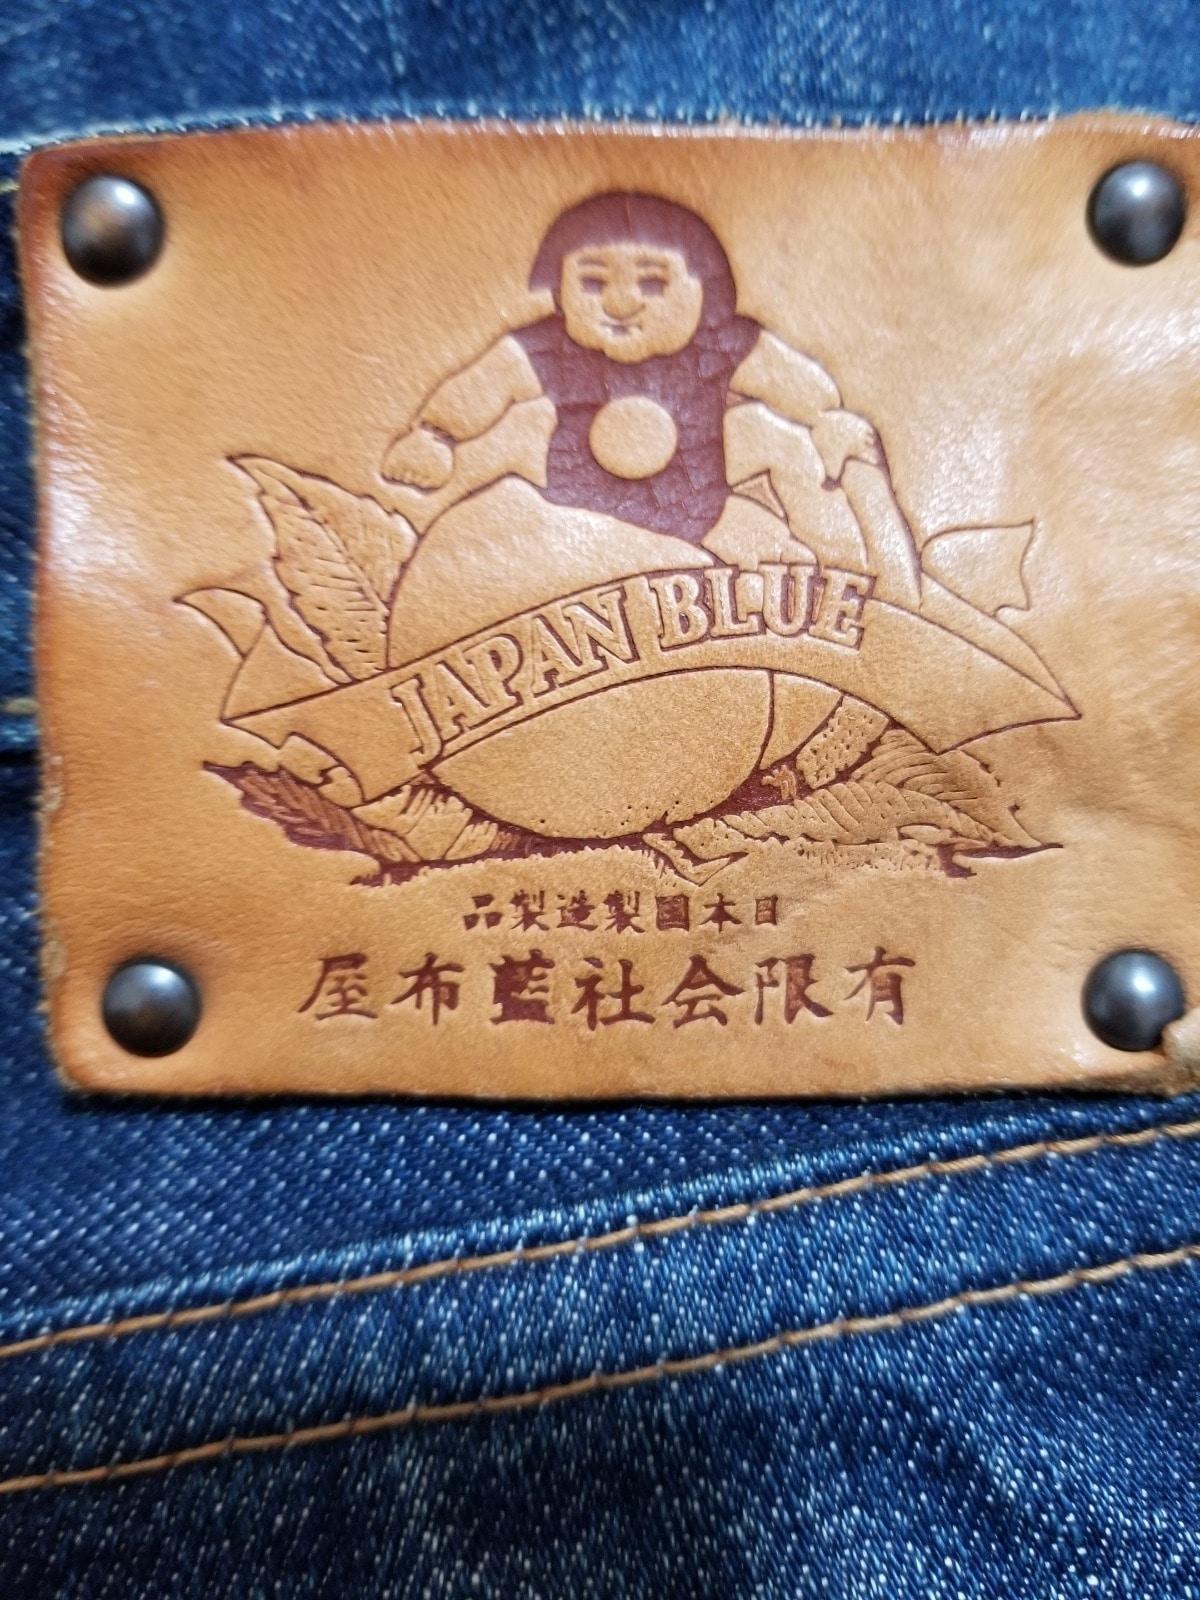 JAPAN BLUE(ジャパンブルー)のジーンズ